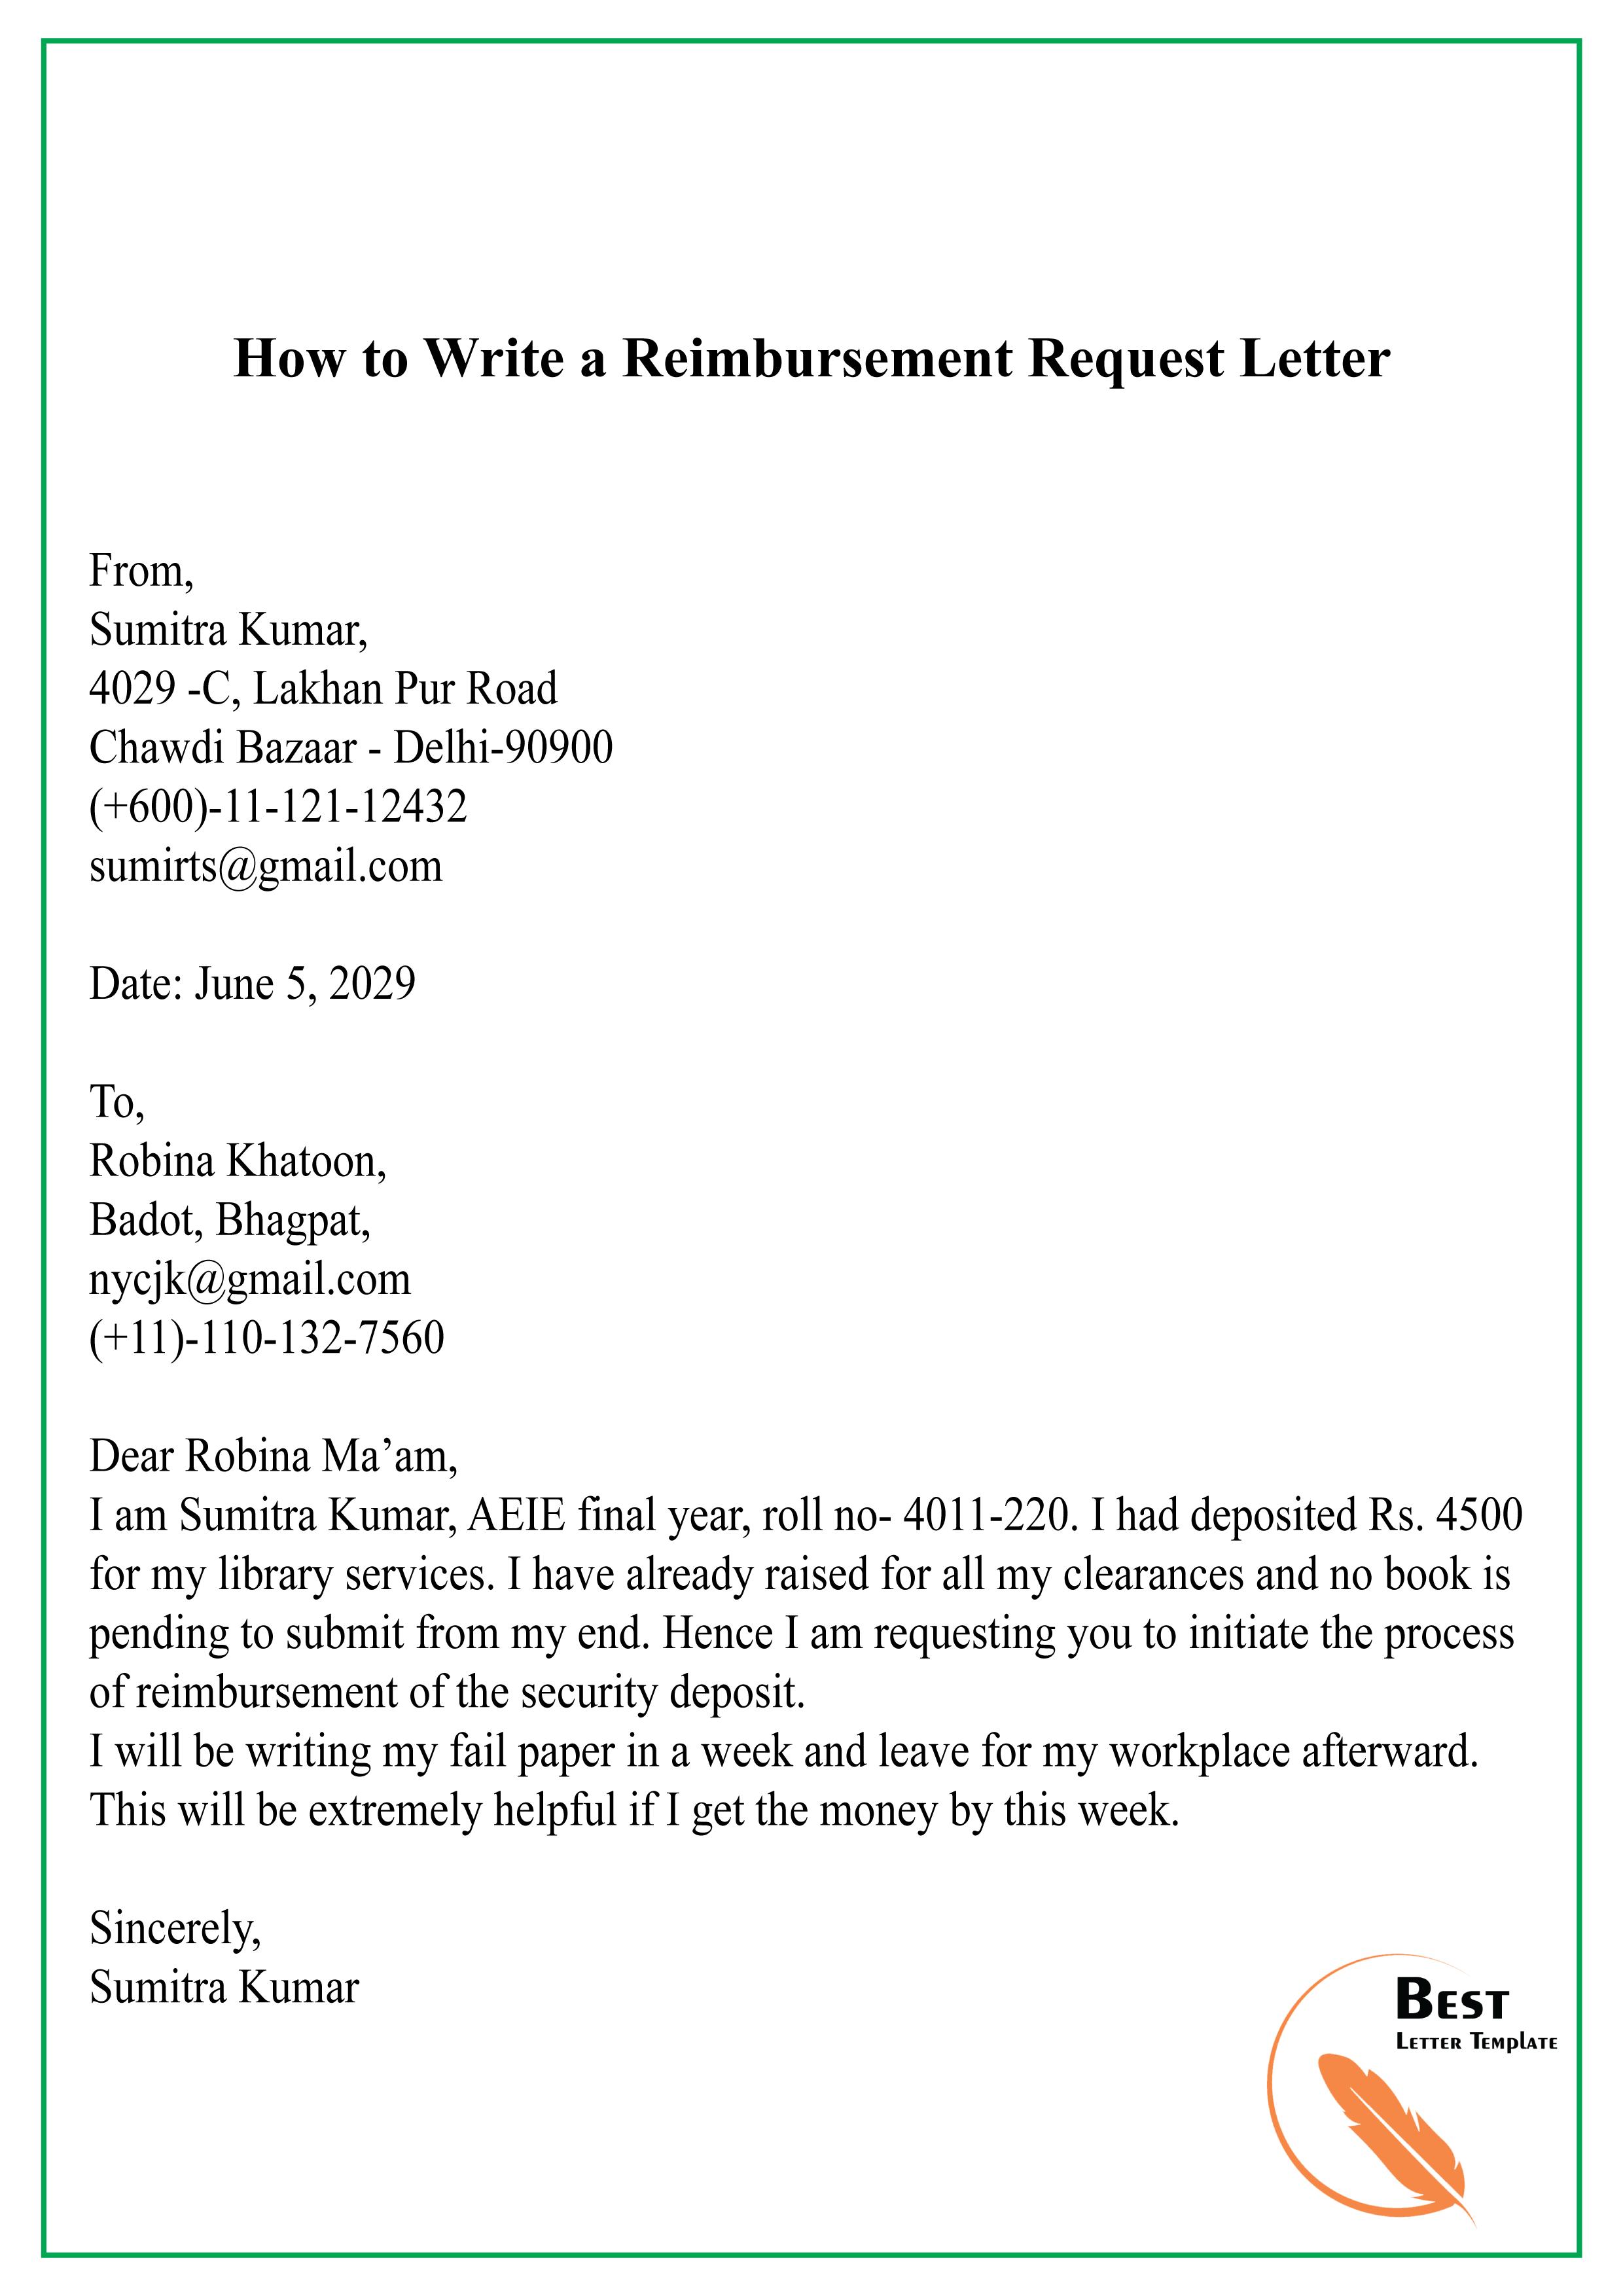 How to Write a Reimbursement Request Letter-01 - Best ...